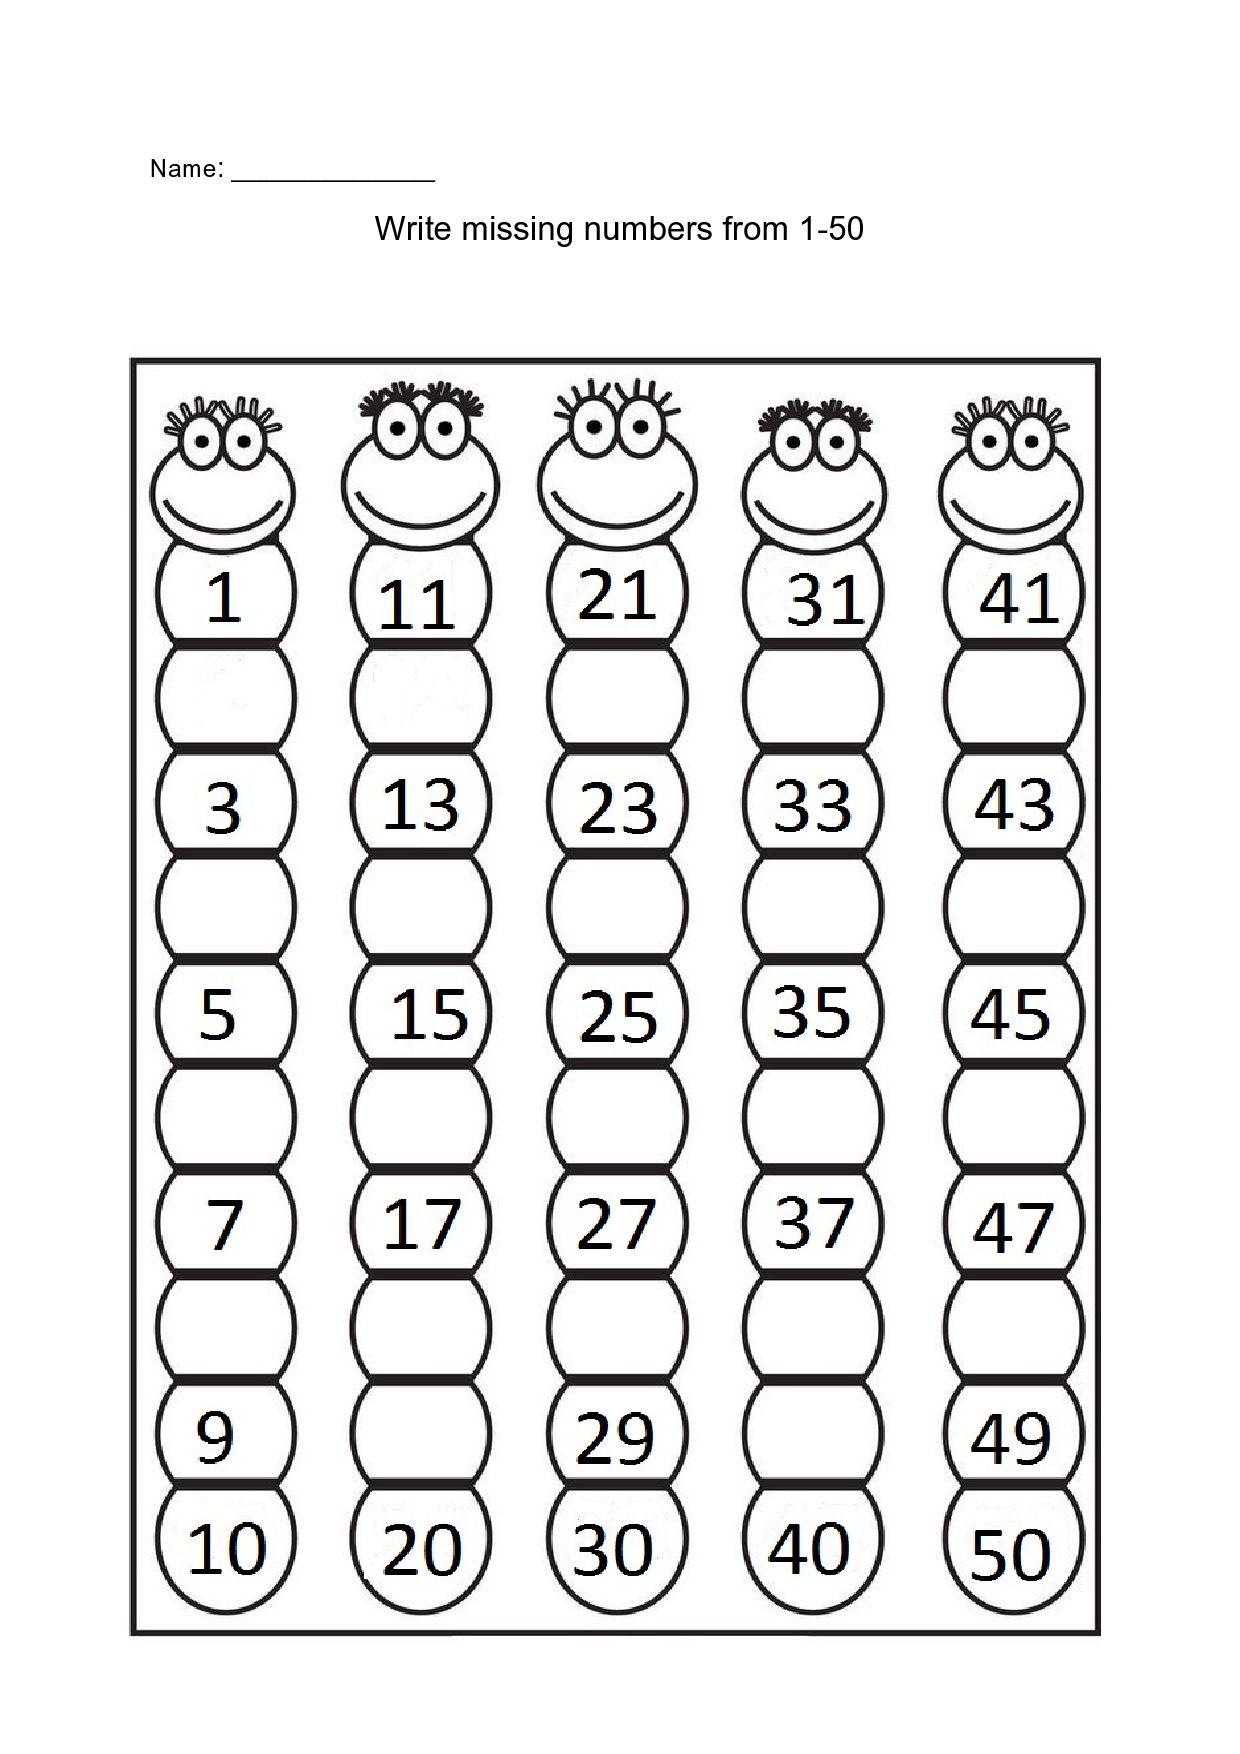 Missing Numbers Missing Number Worksheets Kindergarten Worksheets Number Worksheets Write missing number worksheets